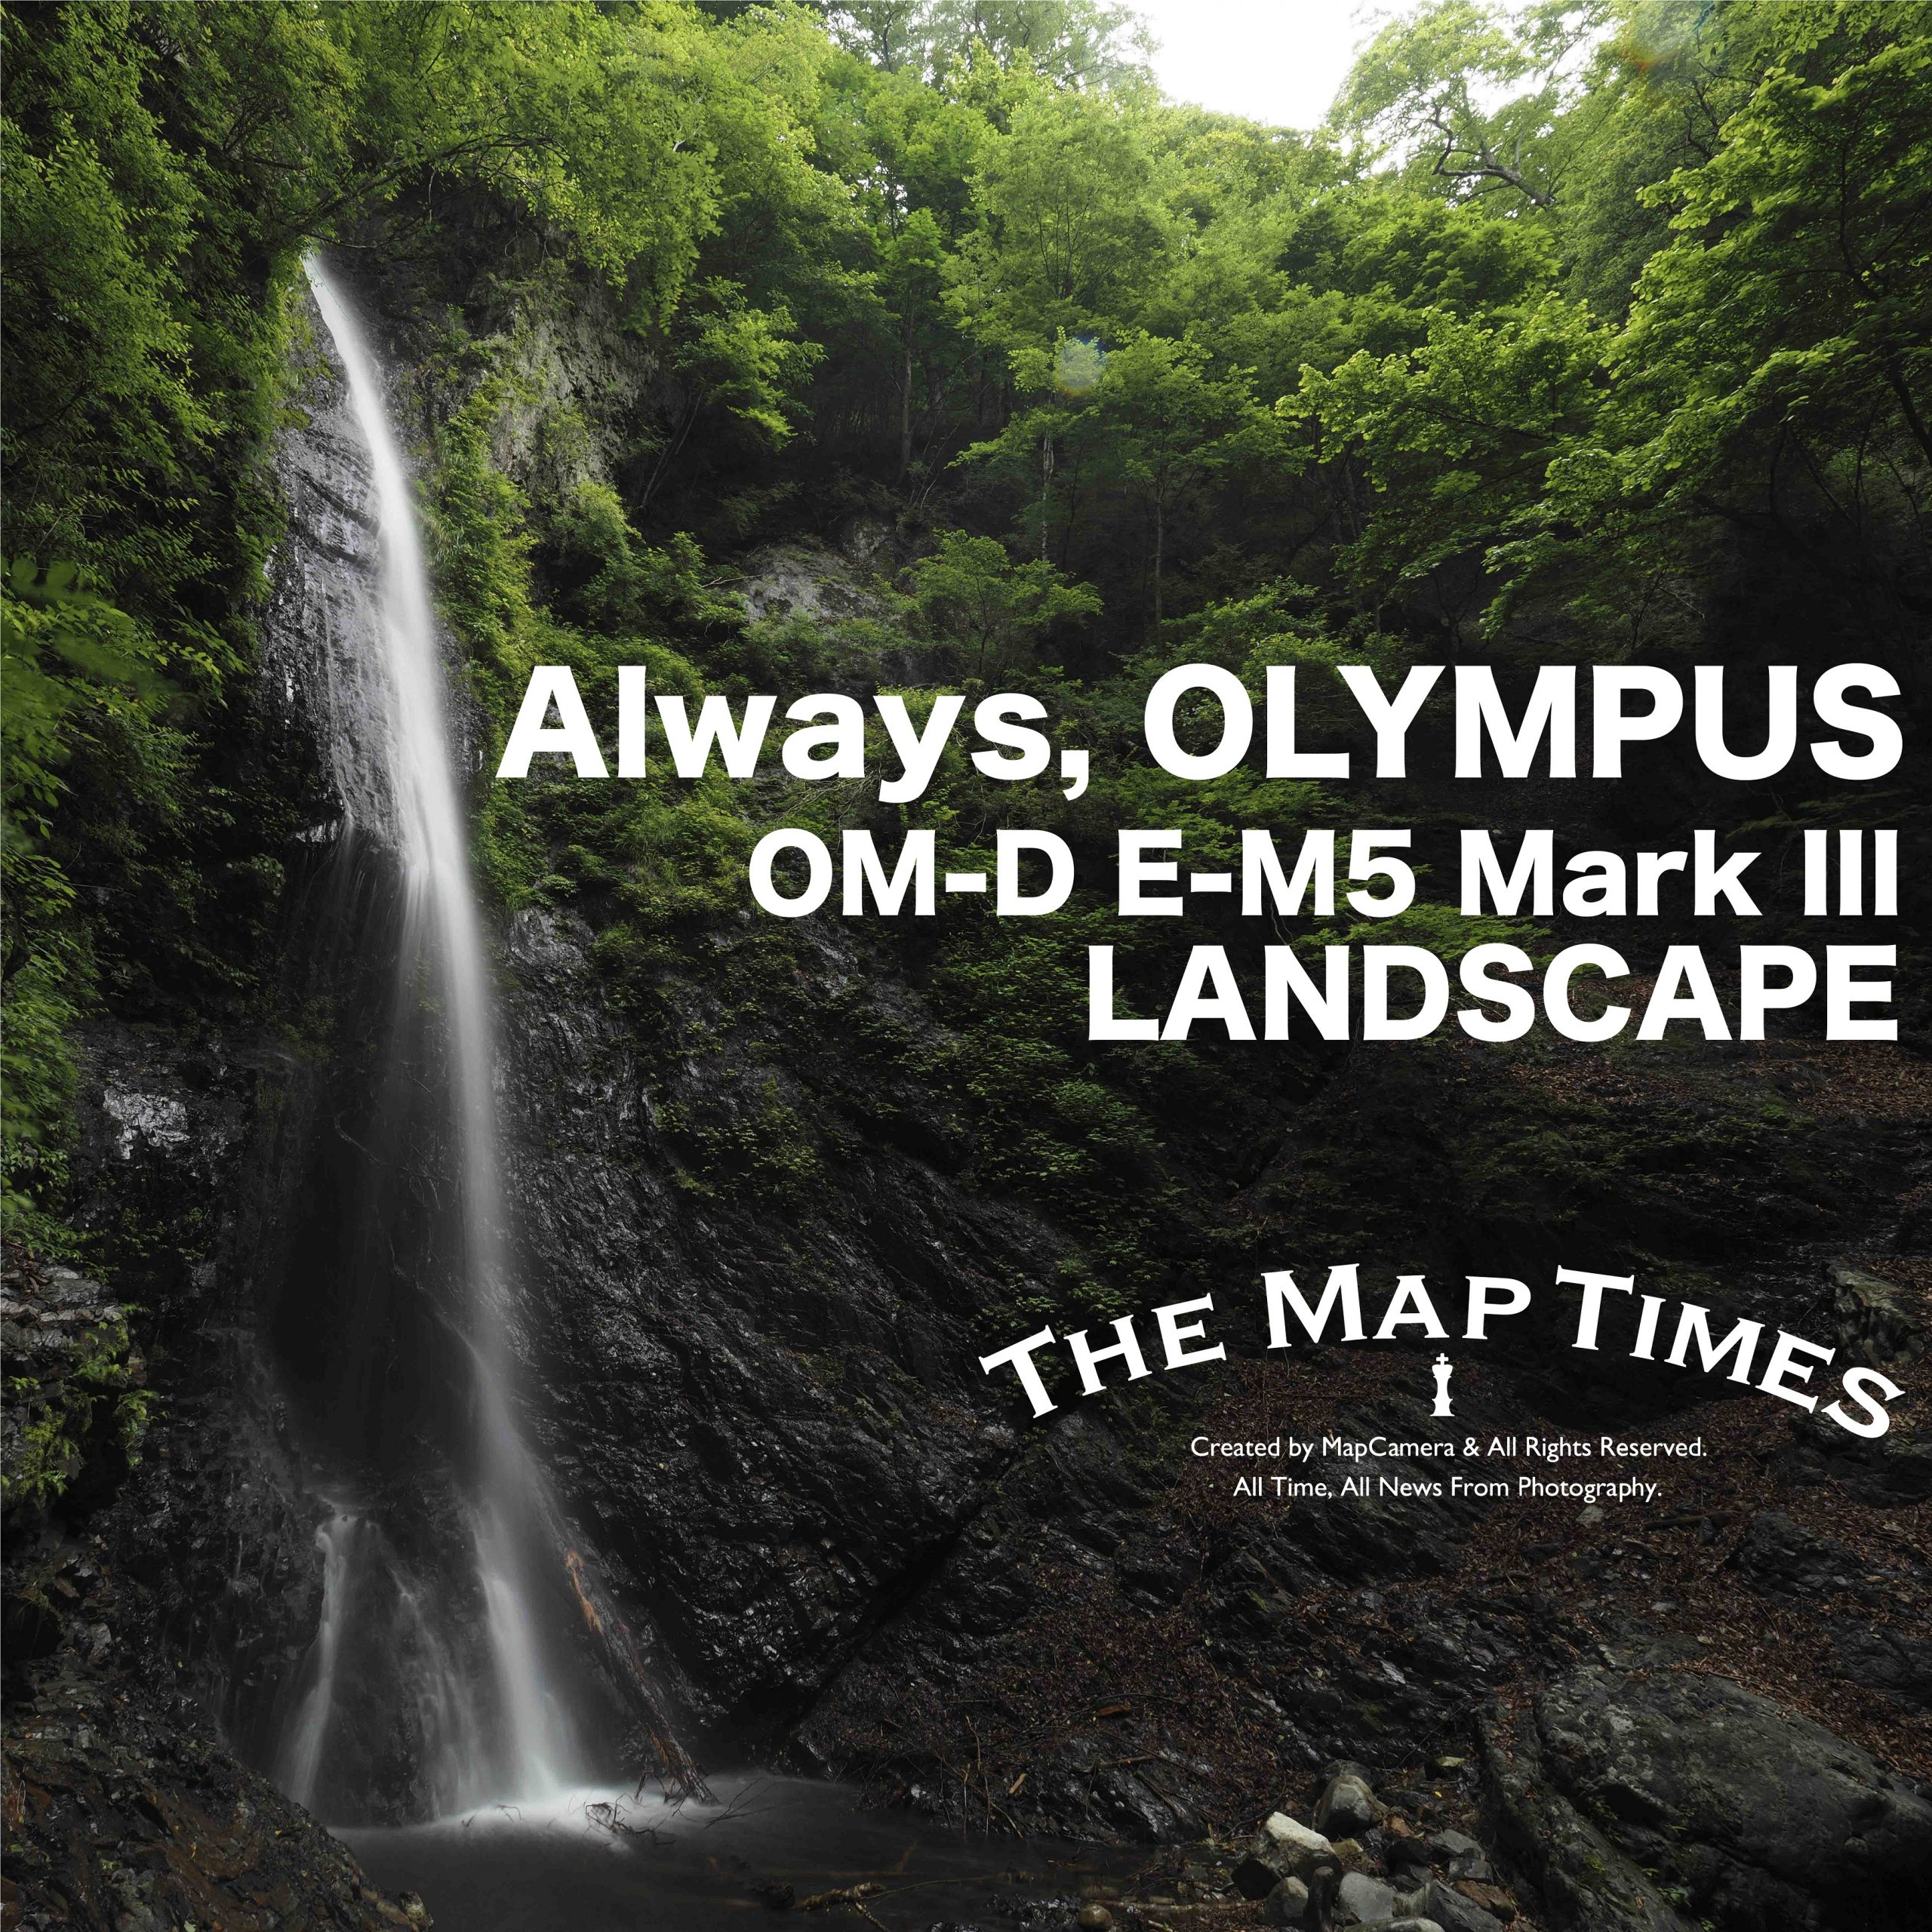 【OLYMPUS】Always, OLYMPUS Ver. OM-D E-M5 Mark III